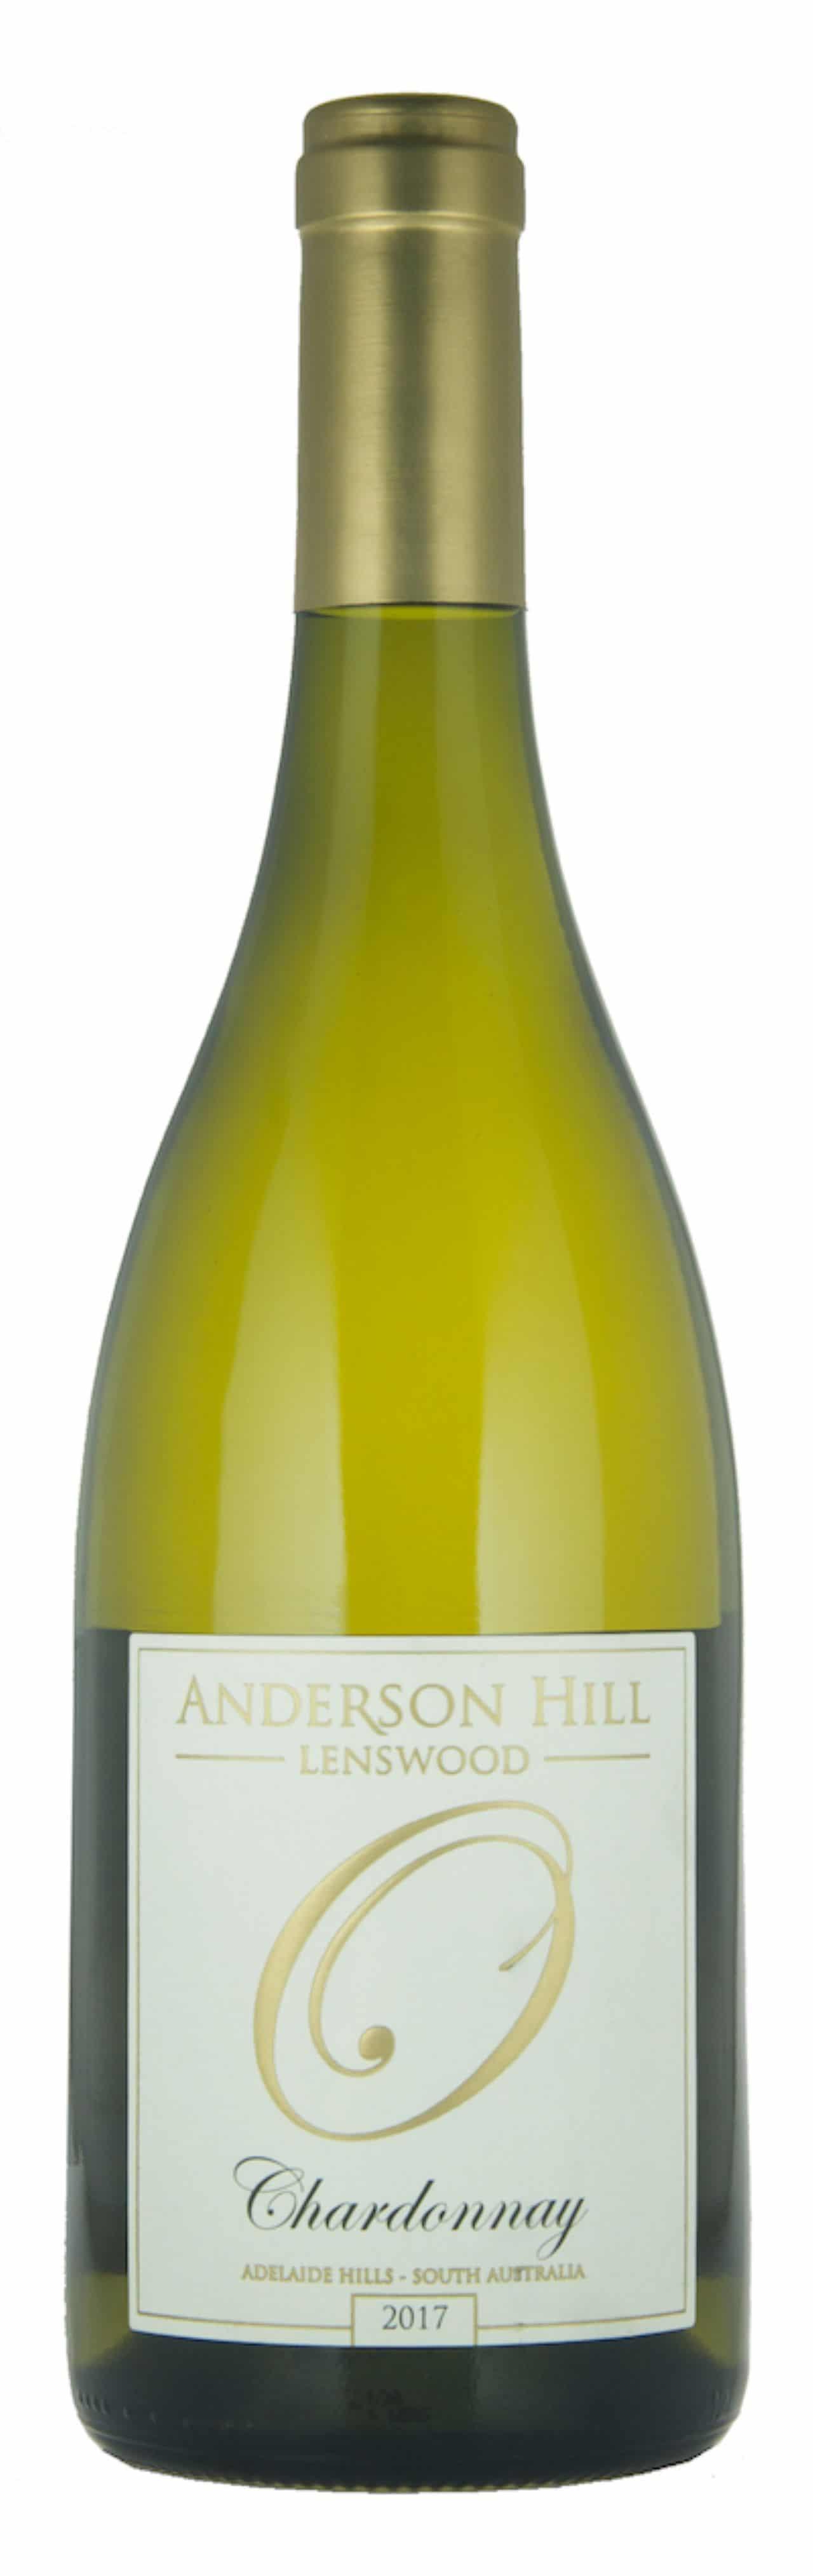 Anderson Hill Chardonnay